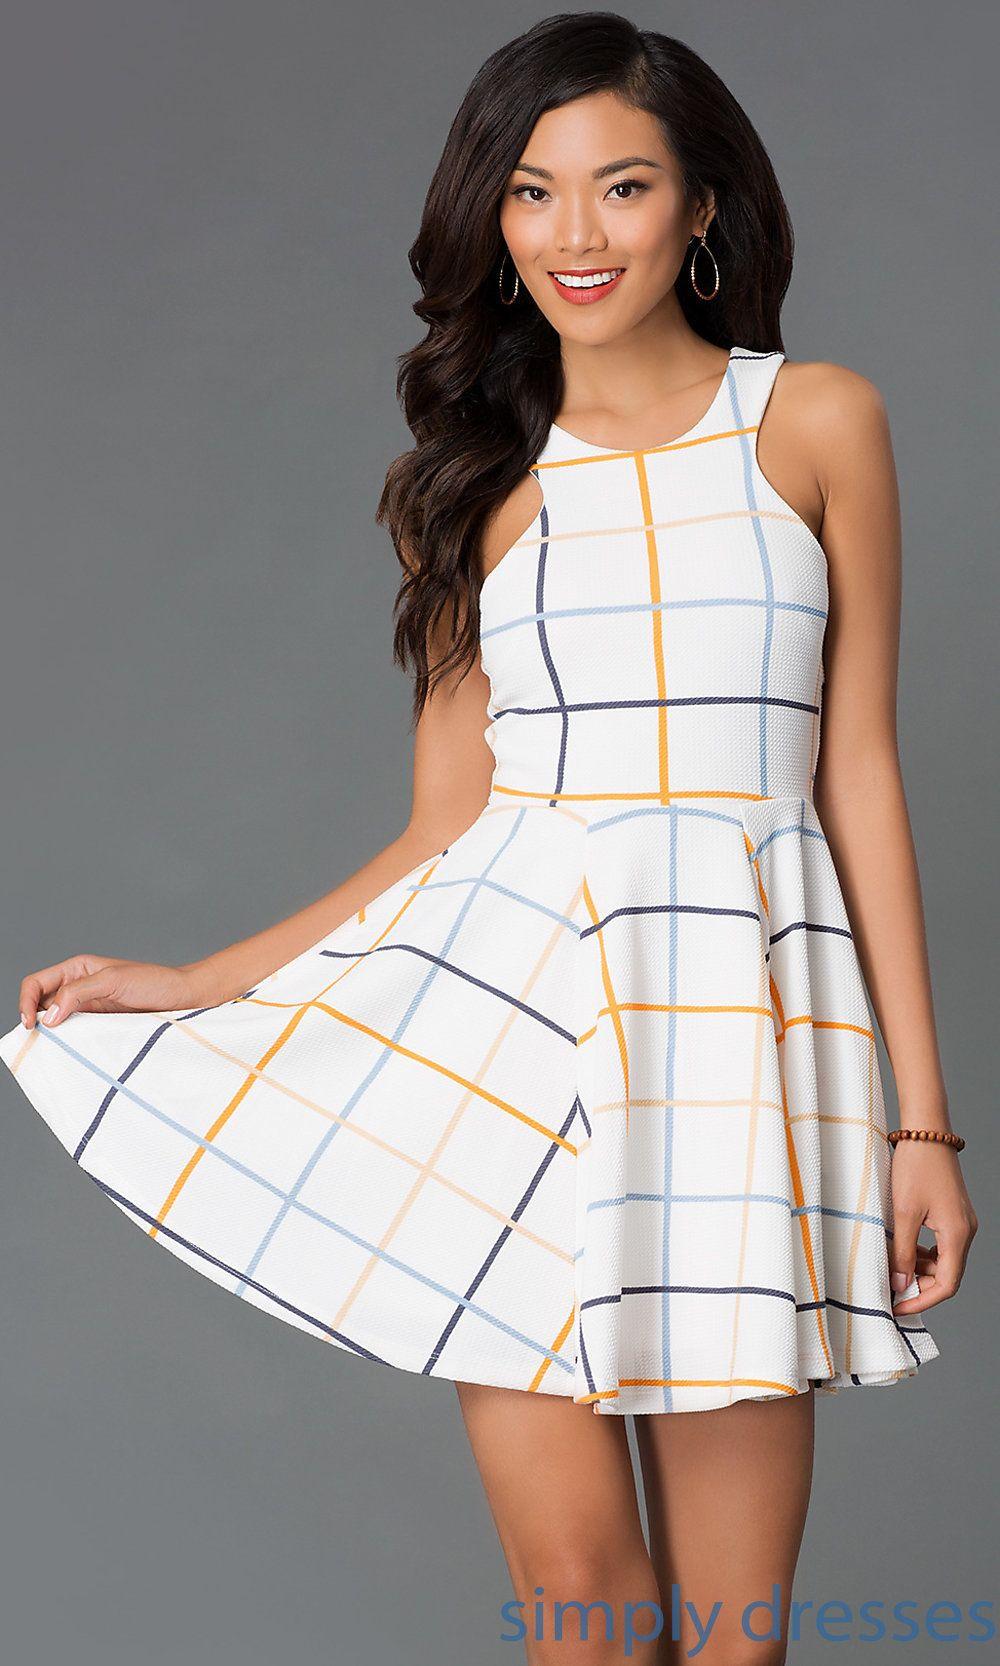 Dresses formal prom dresses evening wear short print casual